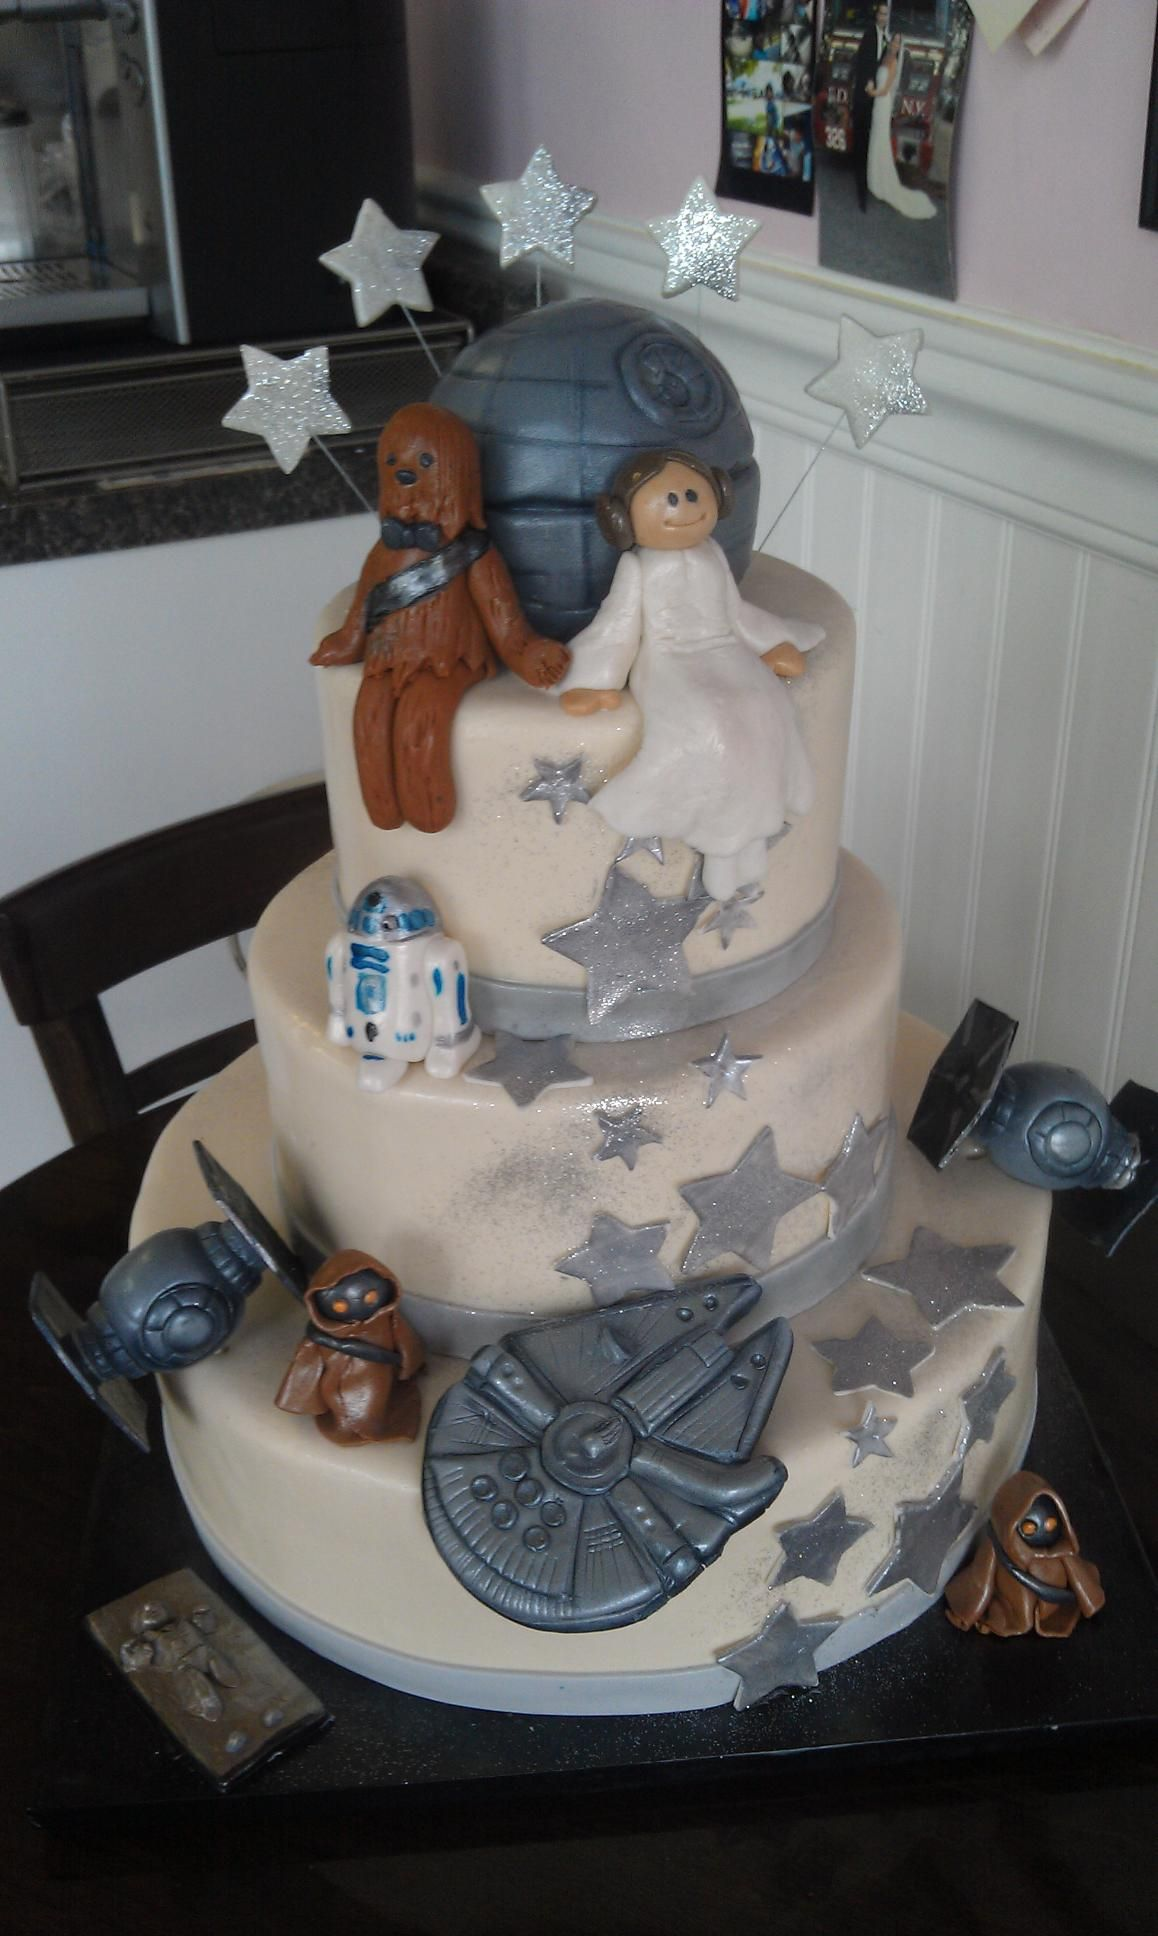 Star Wars Wedding Cake Images : Star wars wedding cake Wedding Pinterest